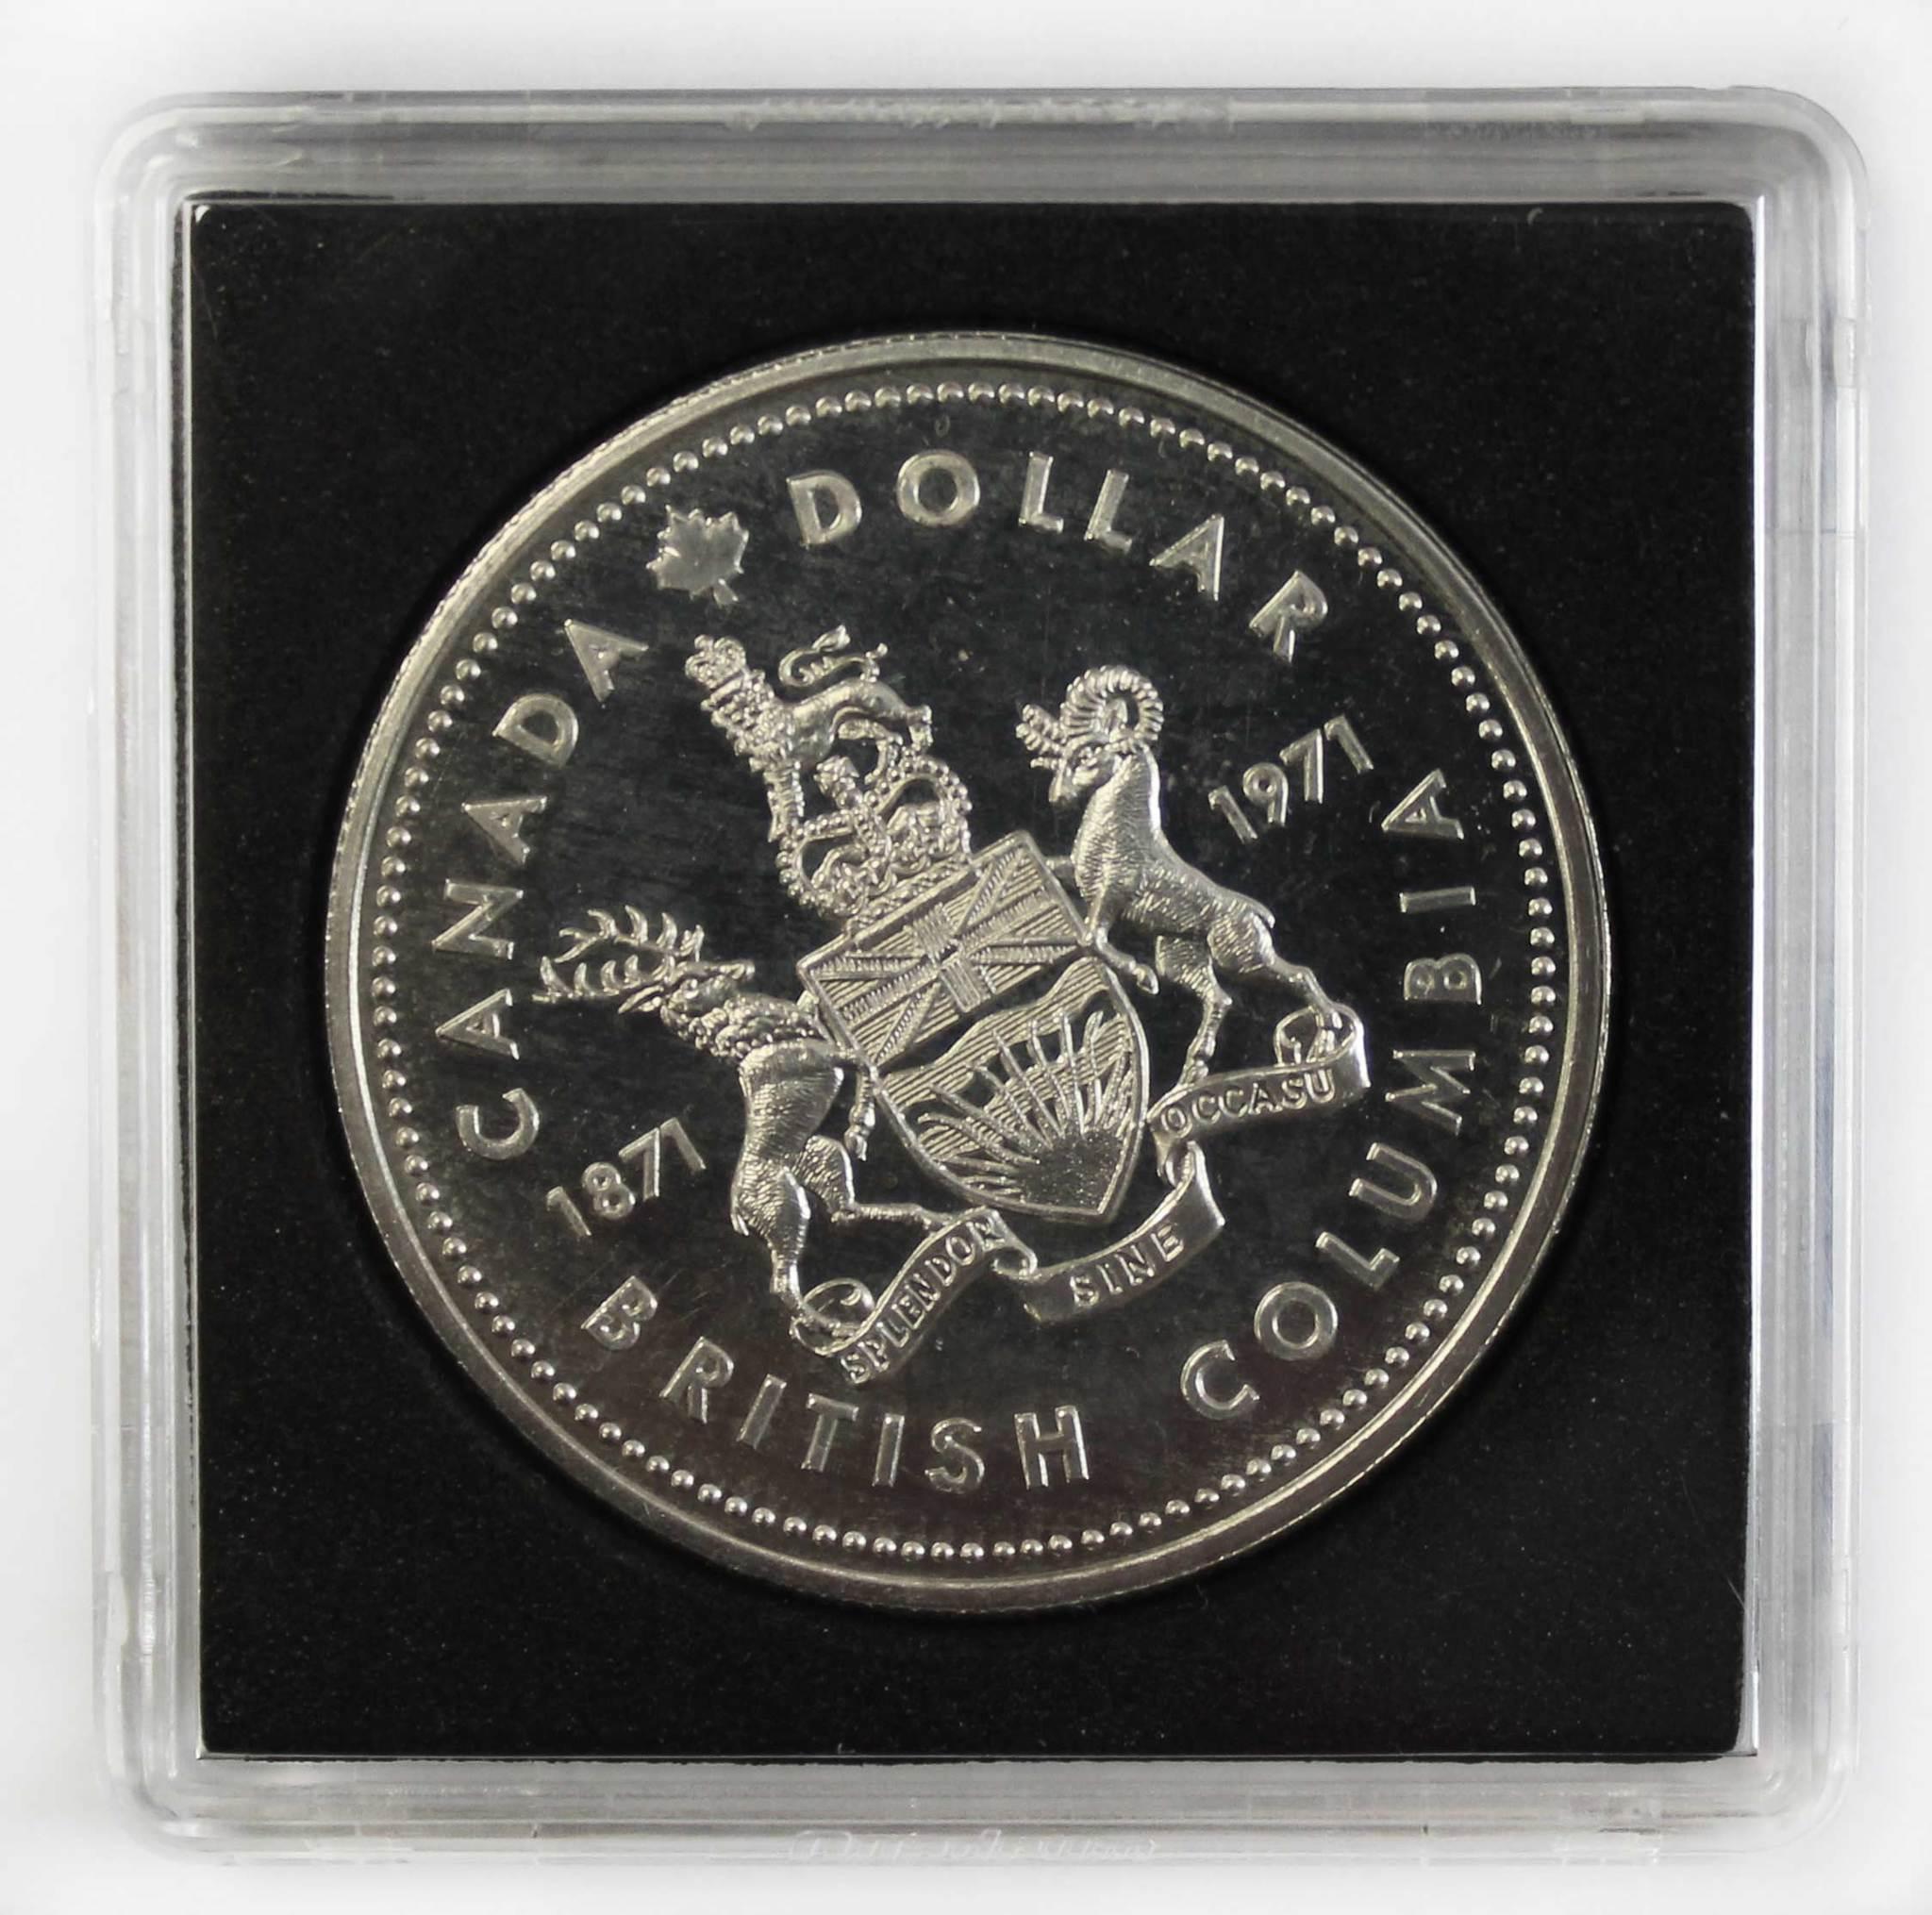 1 доллар. 100 лет присоединению Британской Колумбии. Канада. 1971 год. BrUNC Серебро